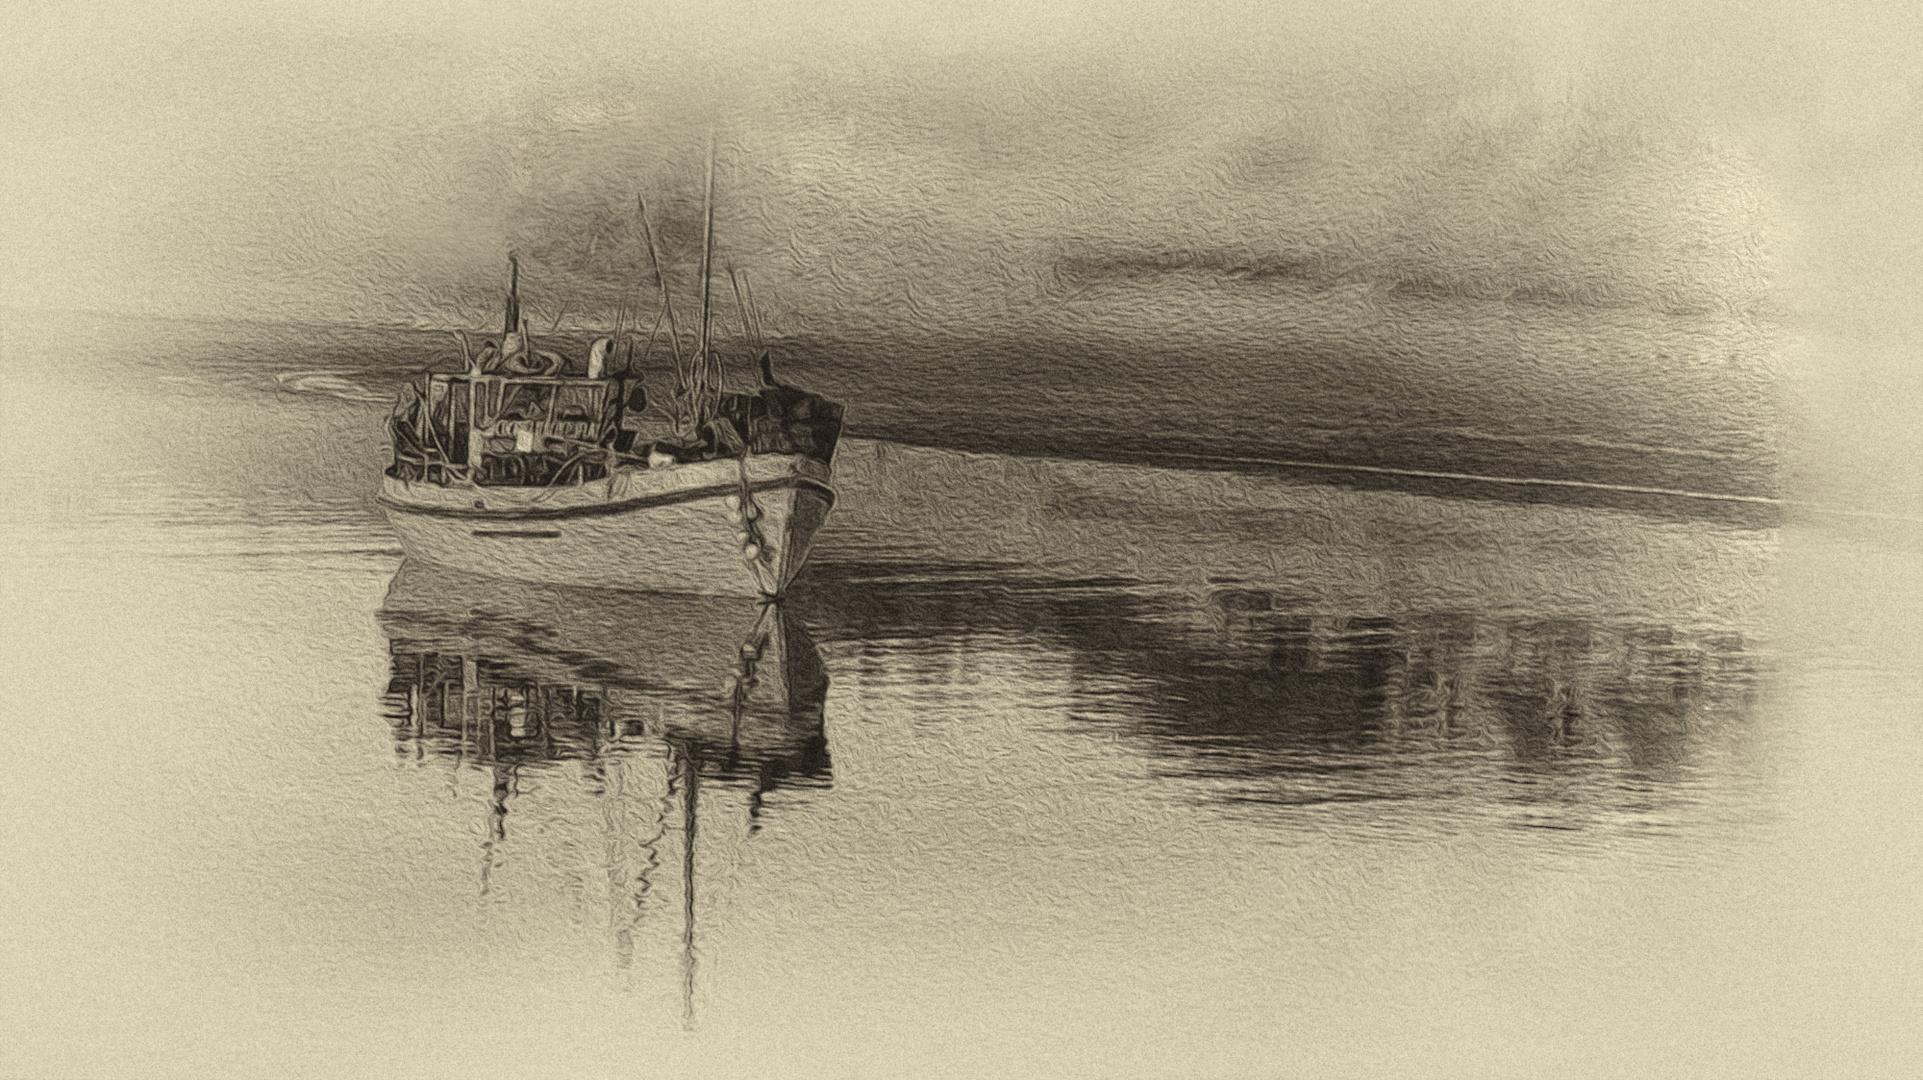 La barca de pesca